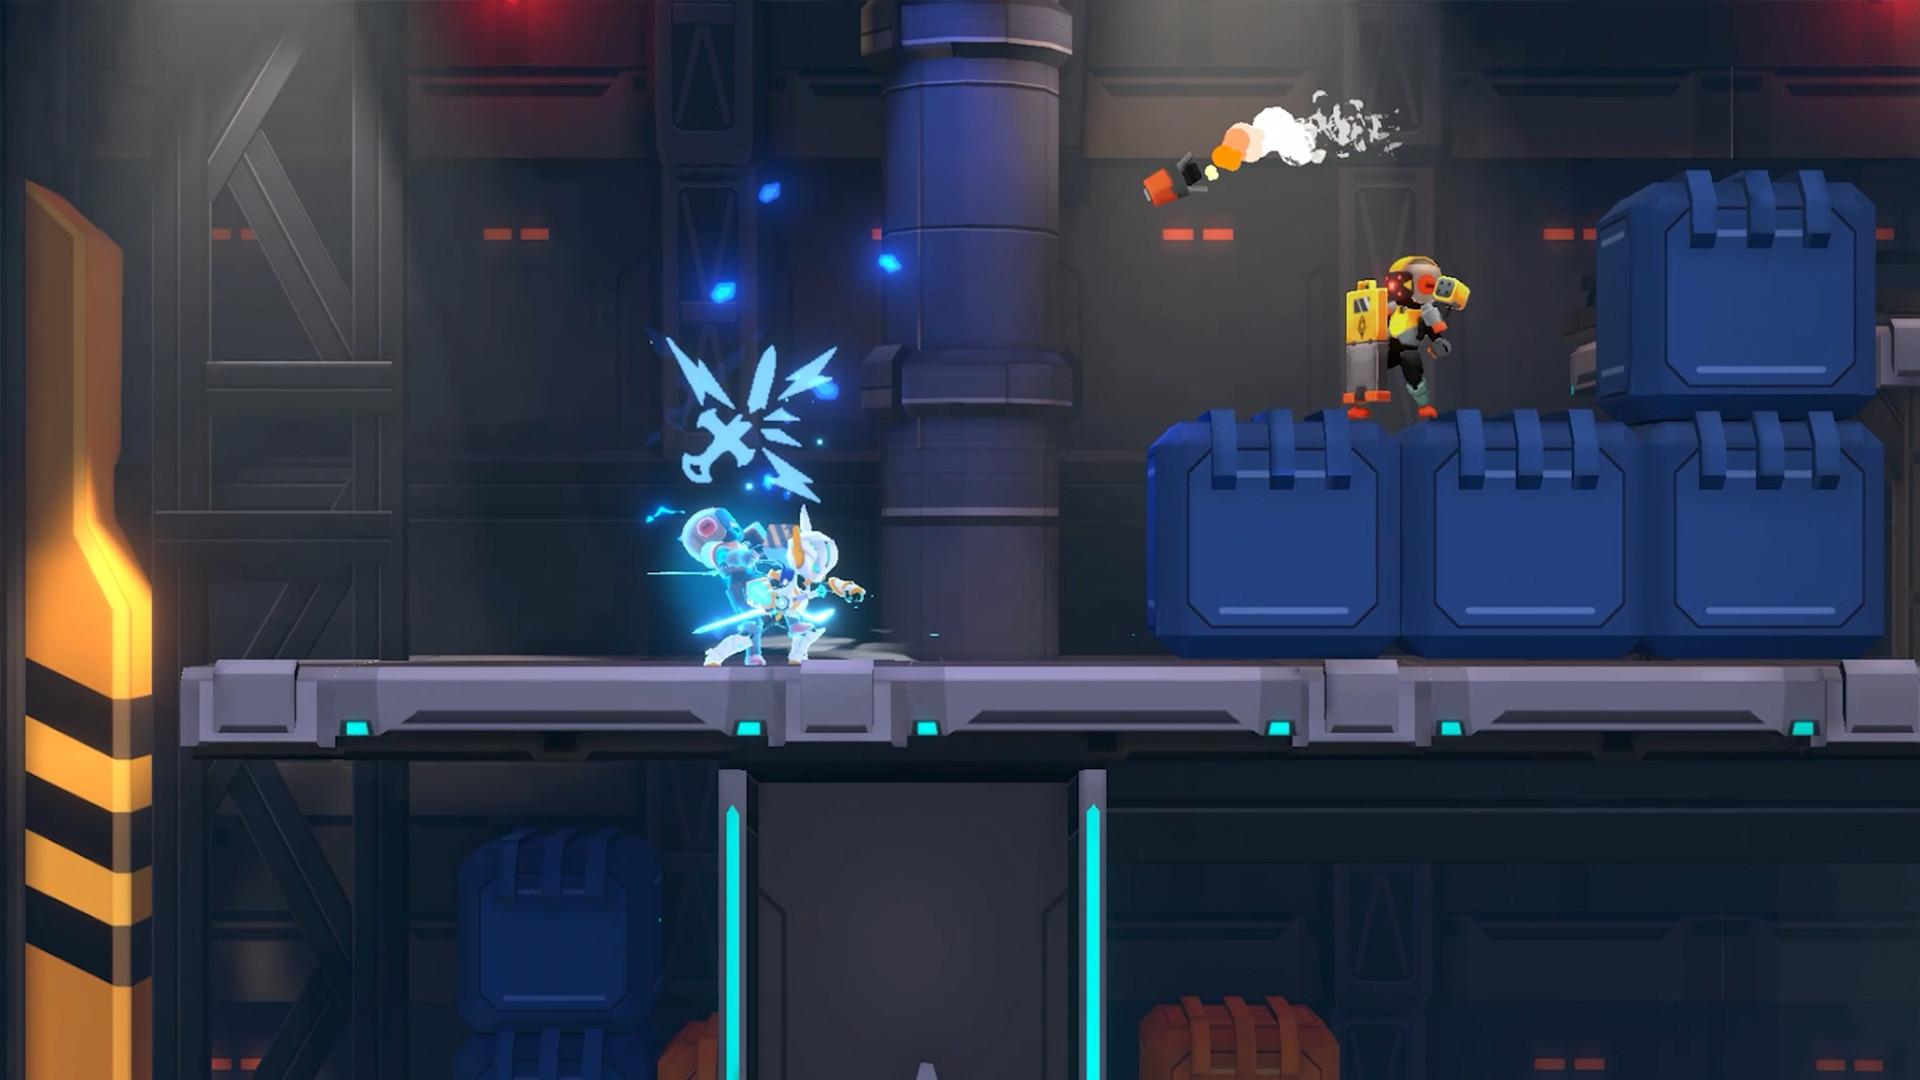 fallen-knight-pc-screenshot-1